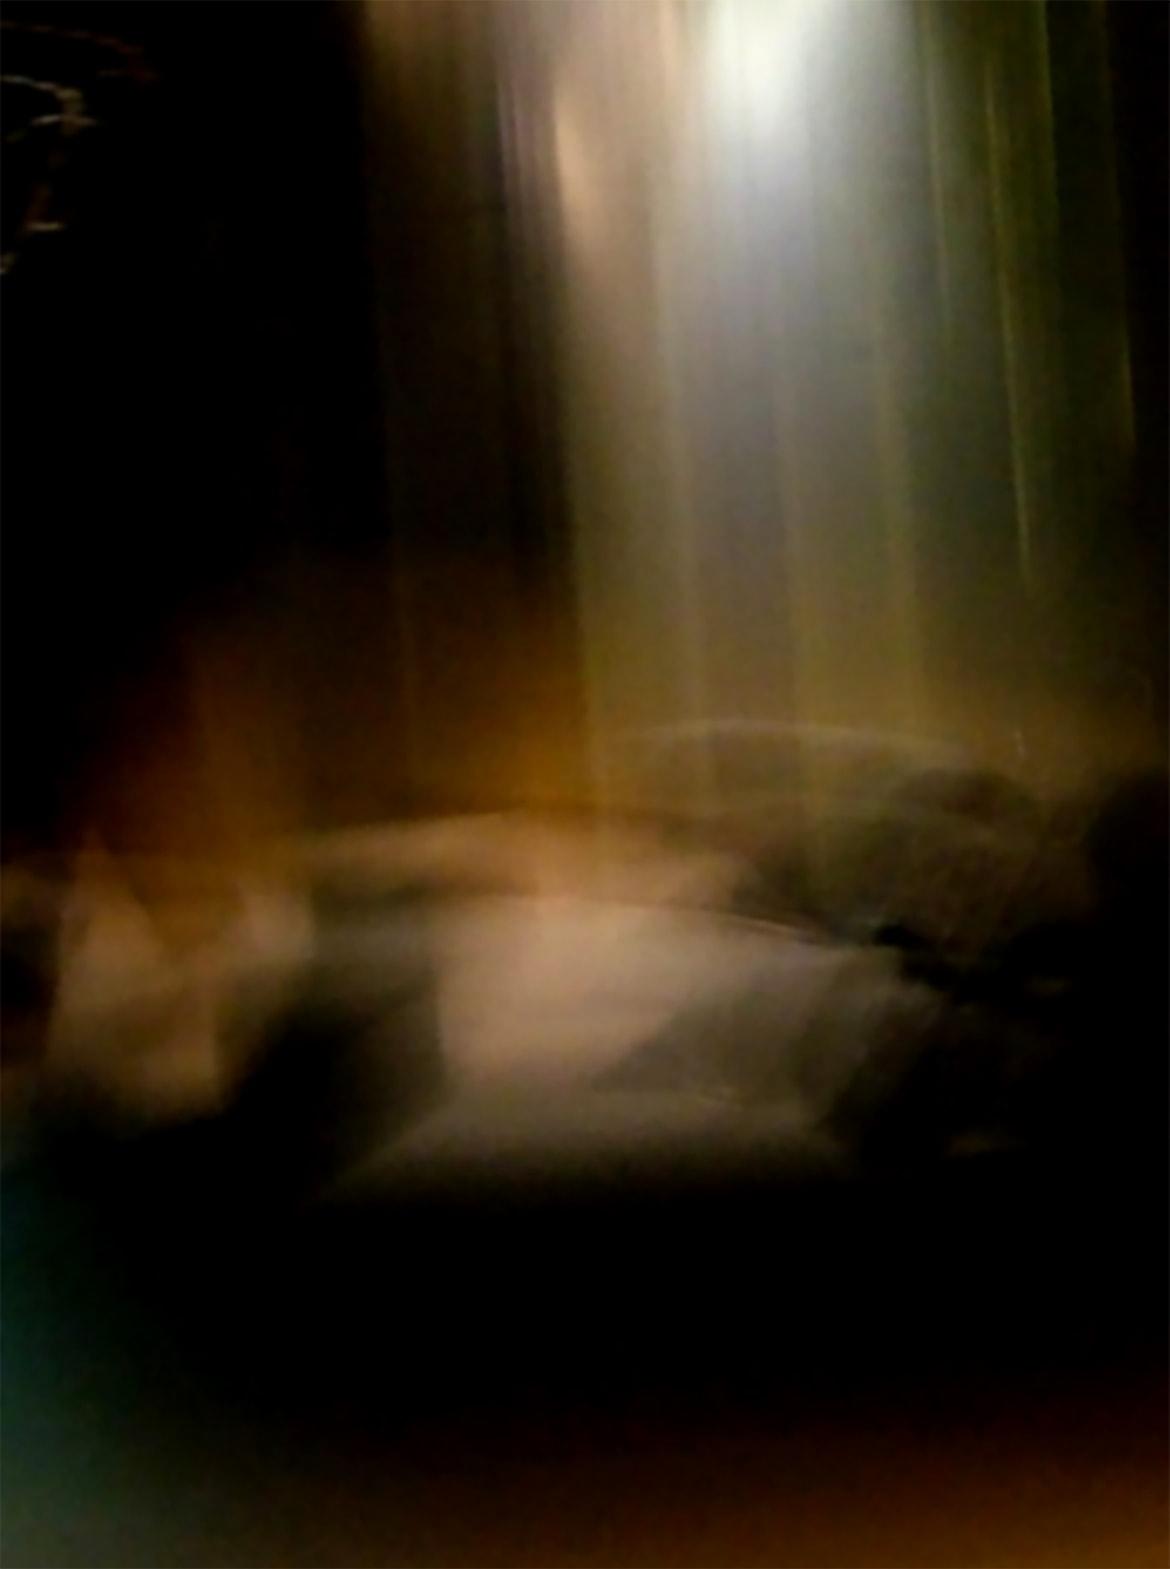 Gary Deirmendjian,'still life –iv', 2005, Duraluxe sublimation aluminium,30 x 23 cm, edition of 7 + 1A.P.